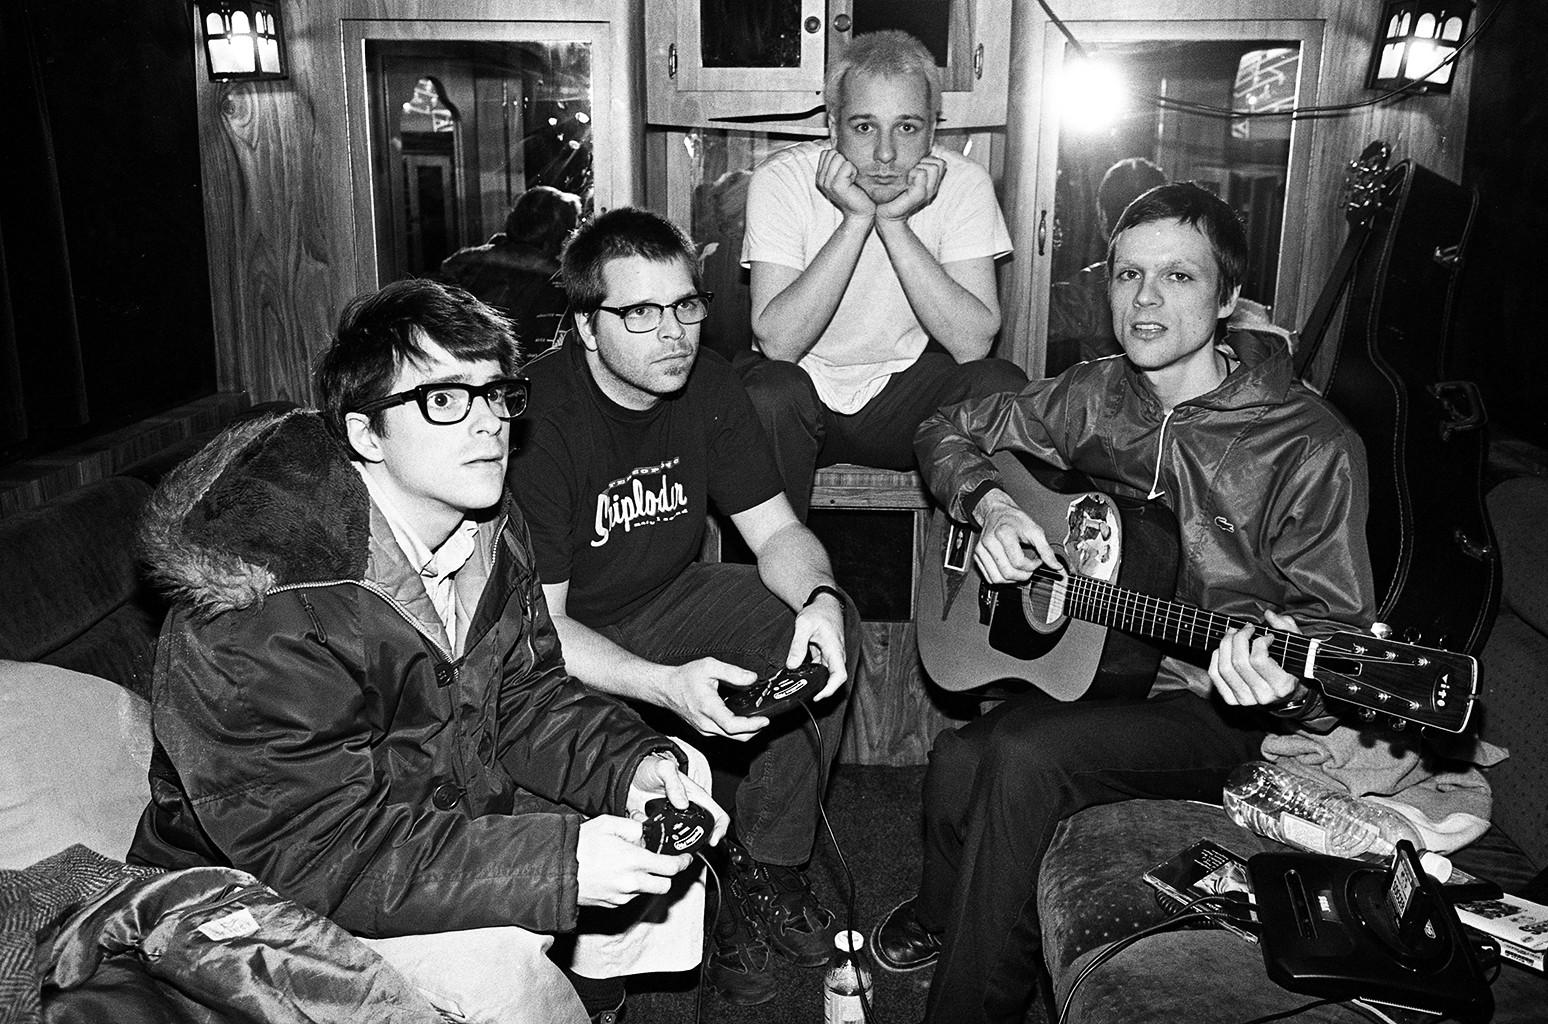 Weezer photographed in 1996.